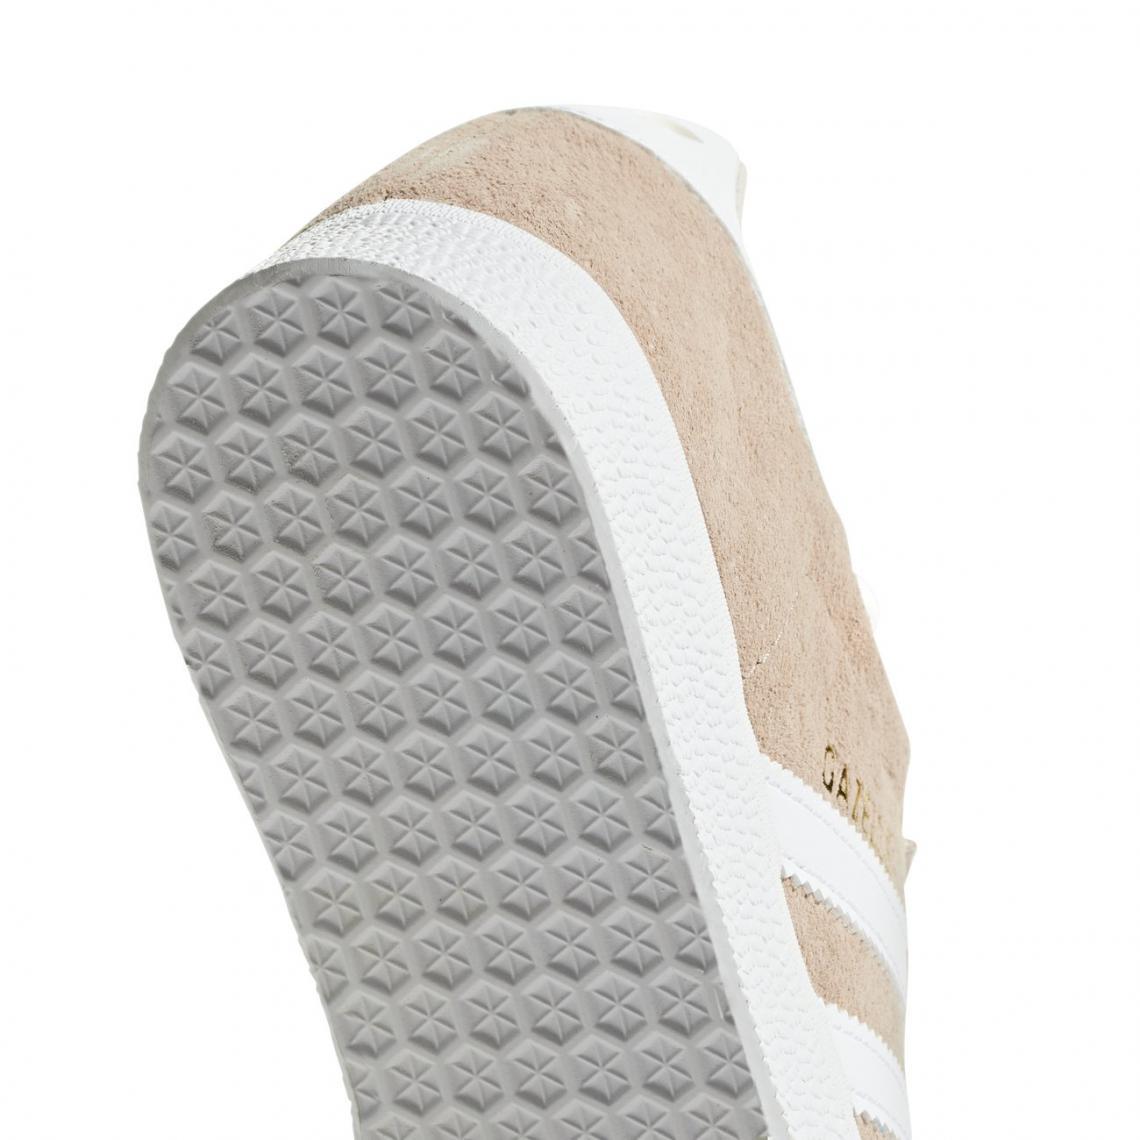 Gazelle W adidas Originals | 3 SUISSES